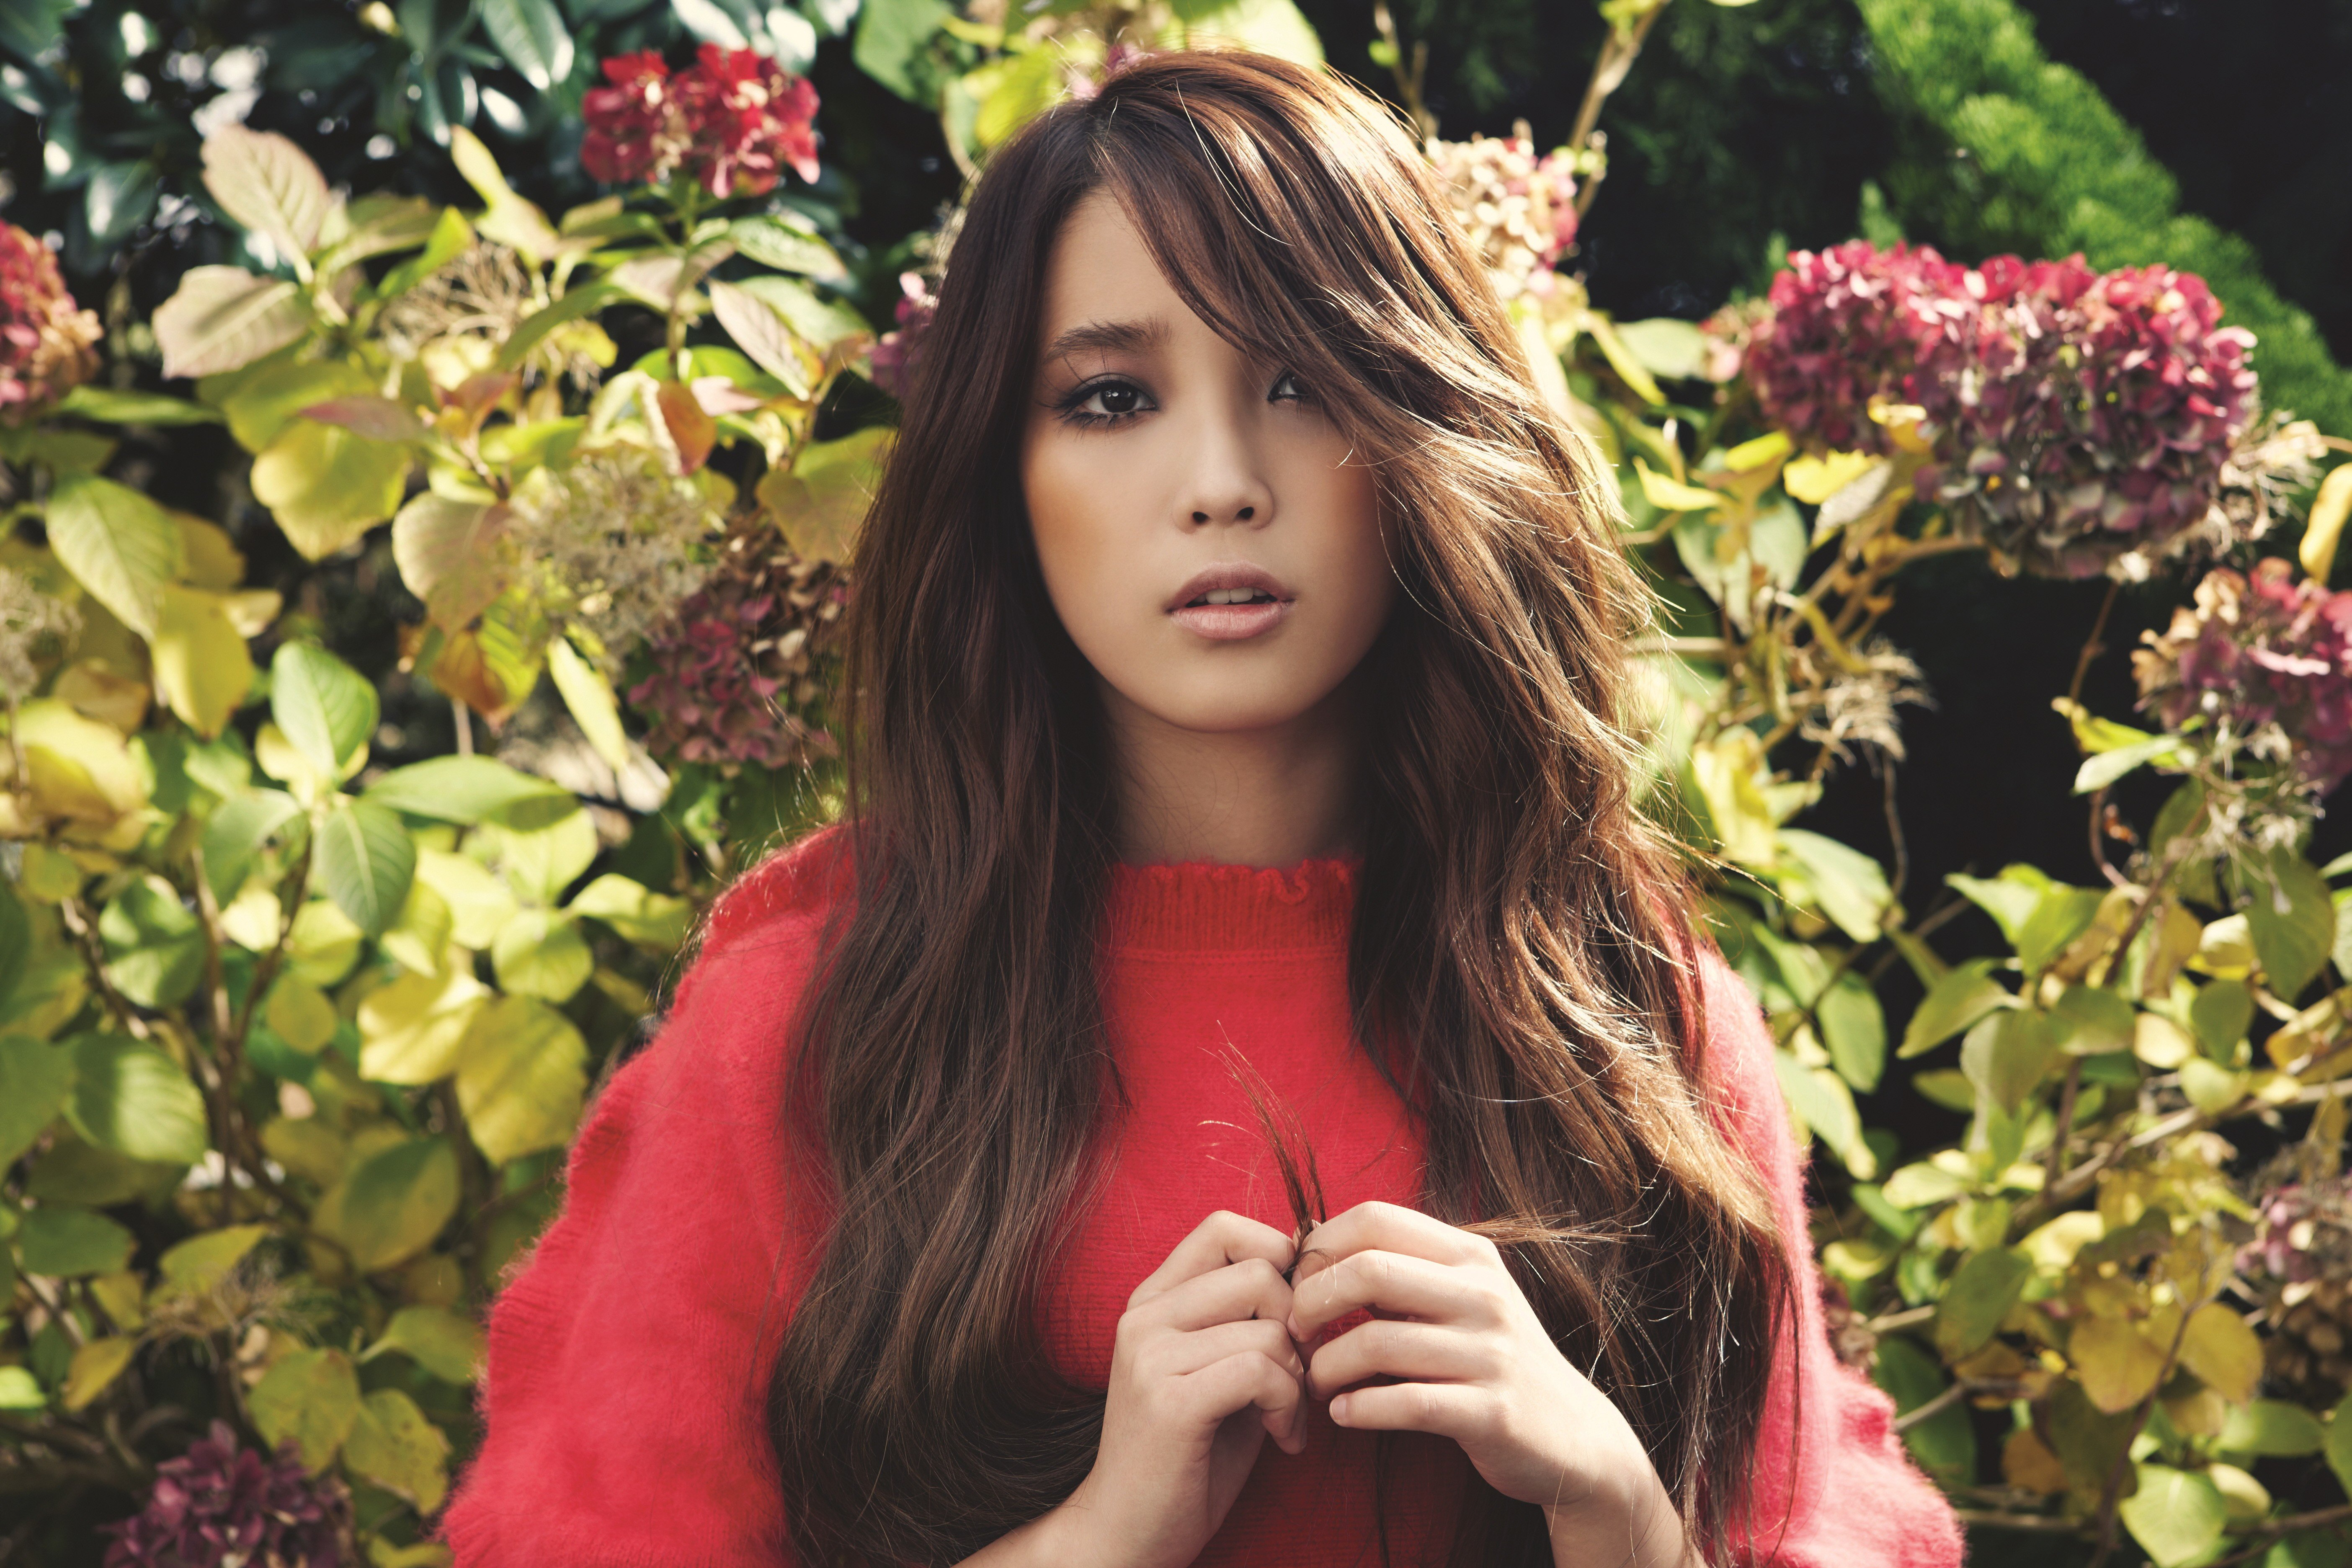 Wallpaper : model, Asian, brunette, Looking into the